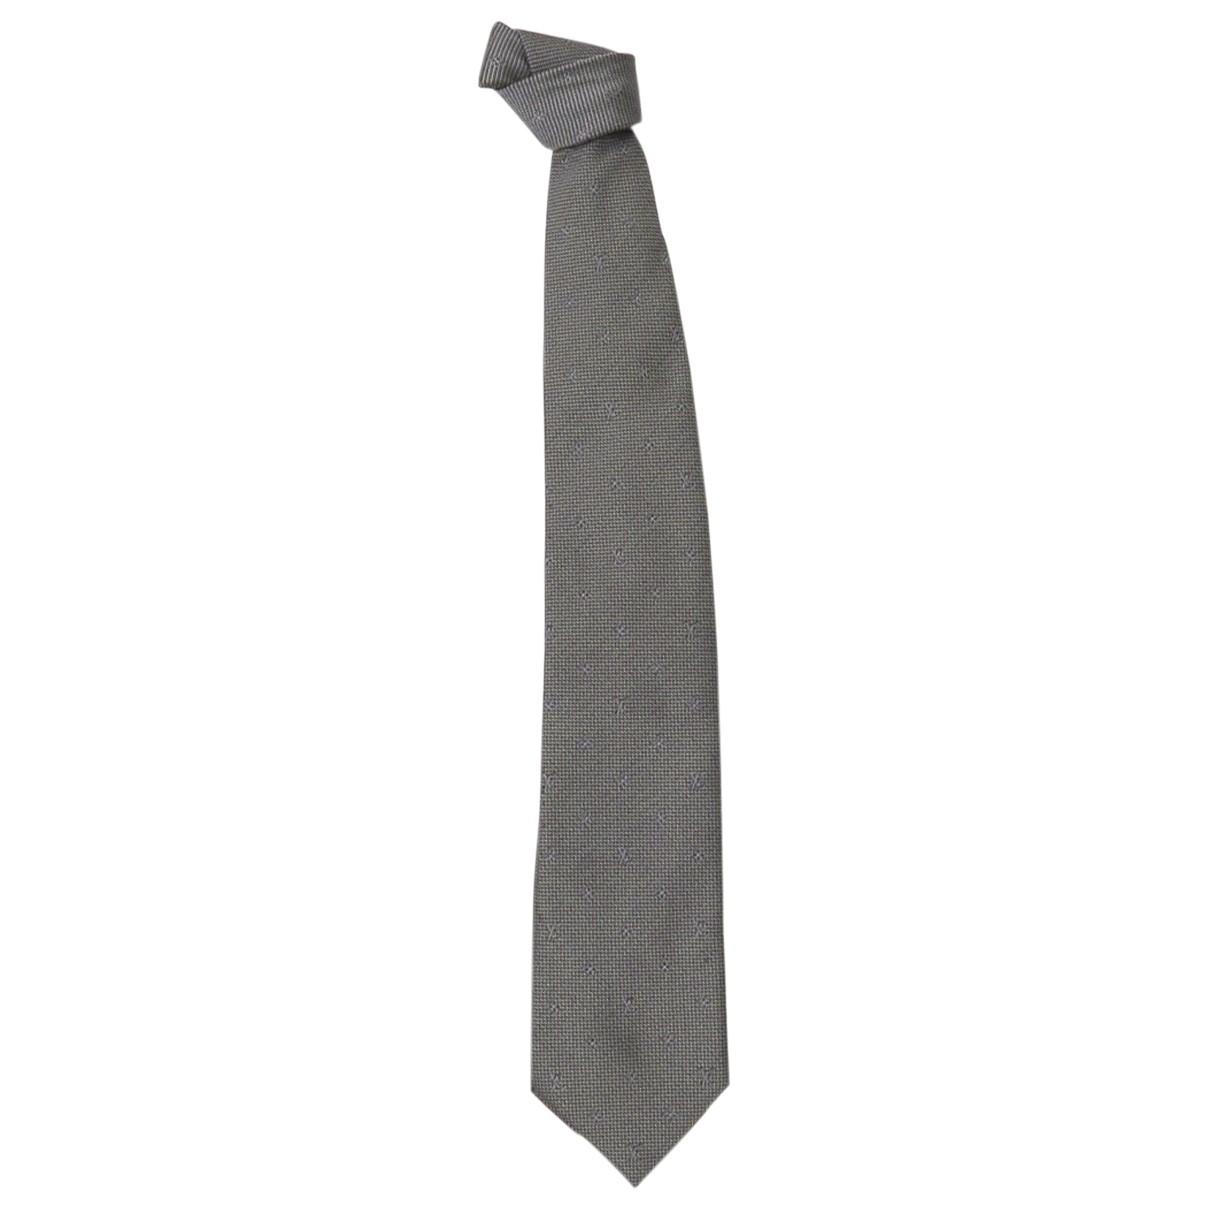 Louis Vuitton N Grey Cotton Ties for Men N